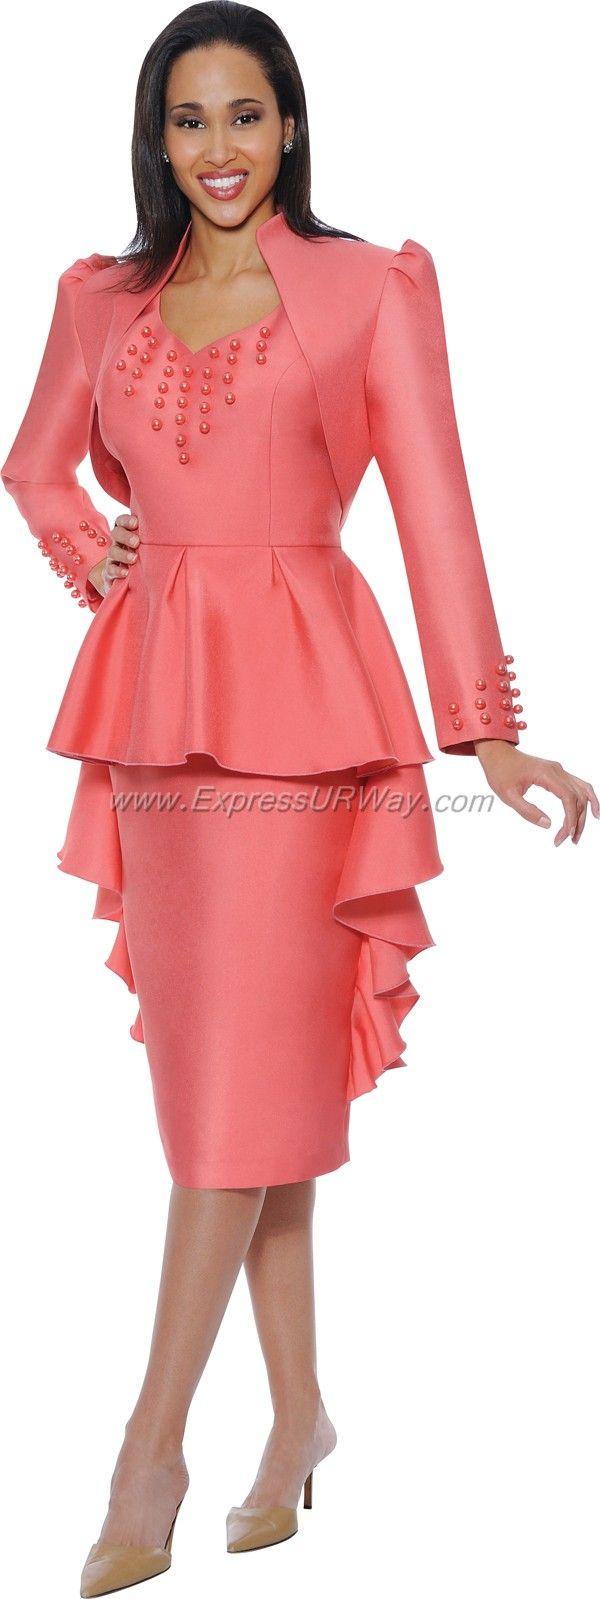 149 best church gear images on Pinterest | Ladies church suits ...